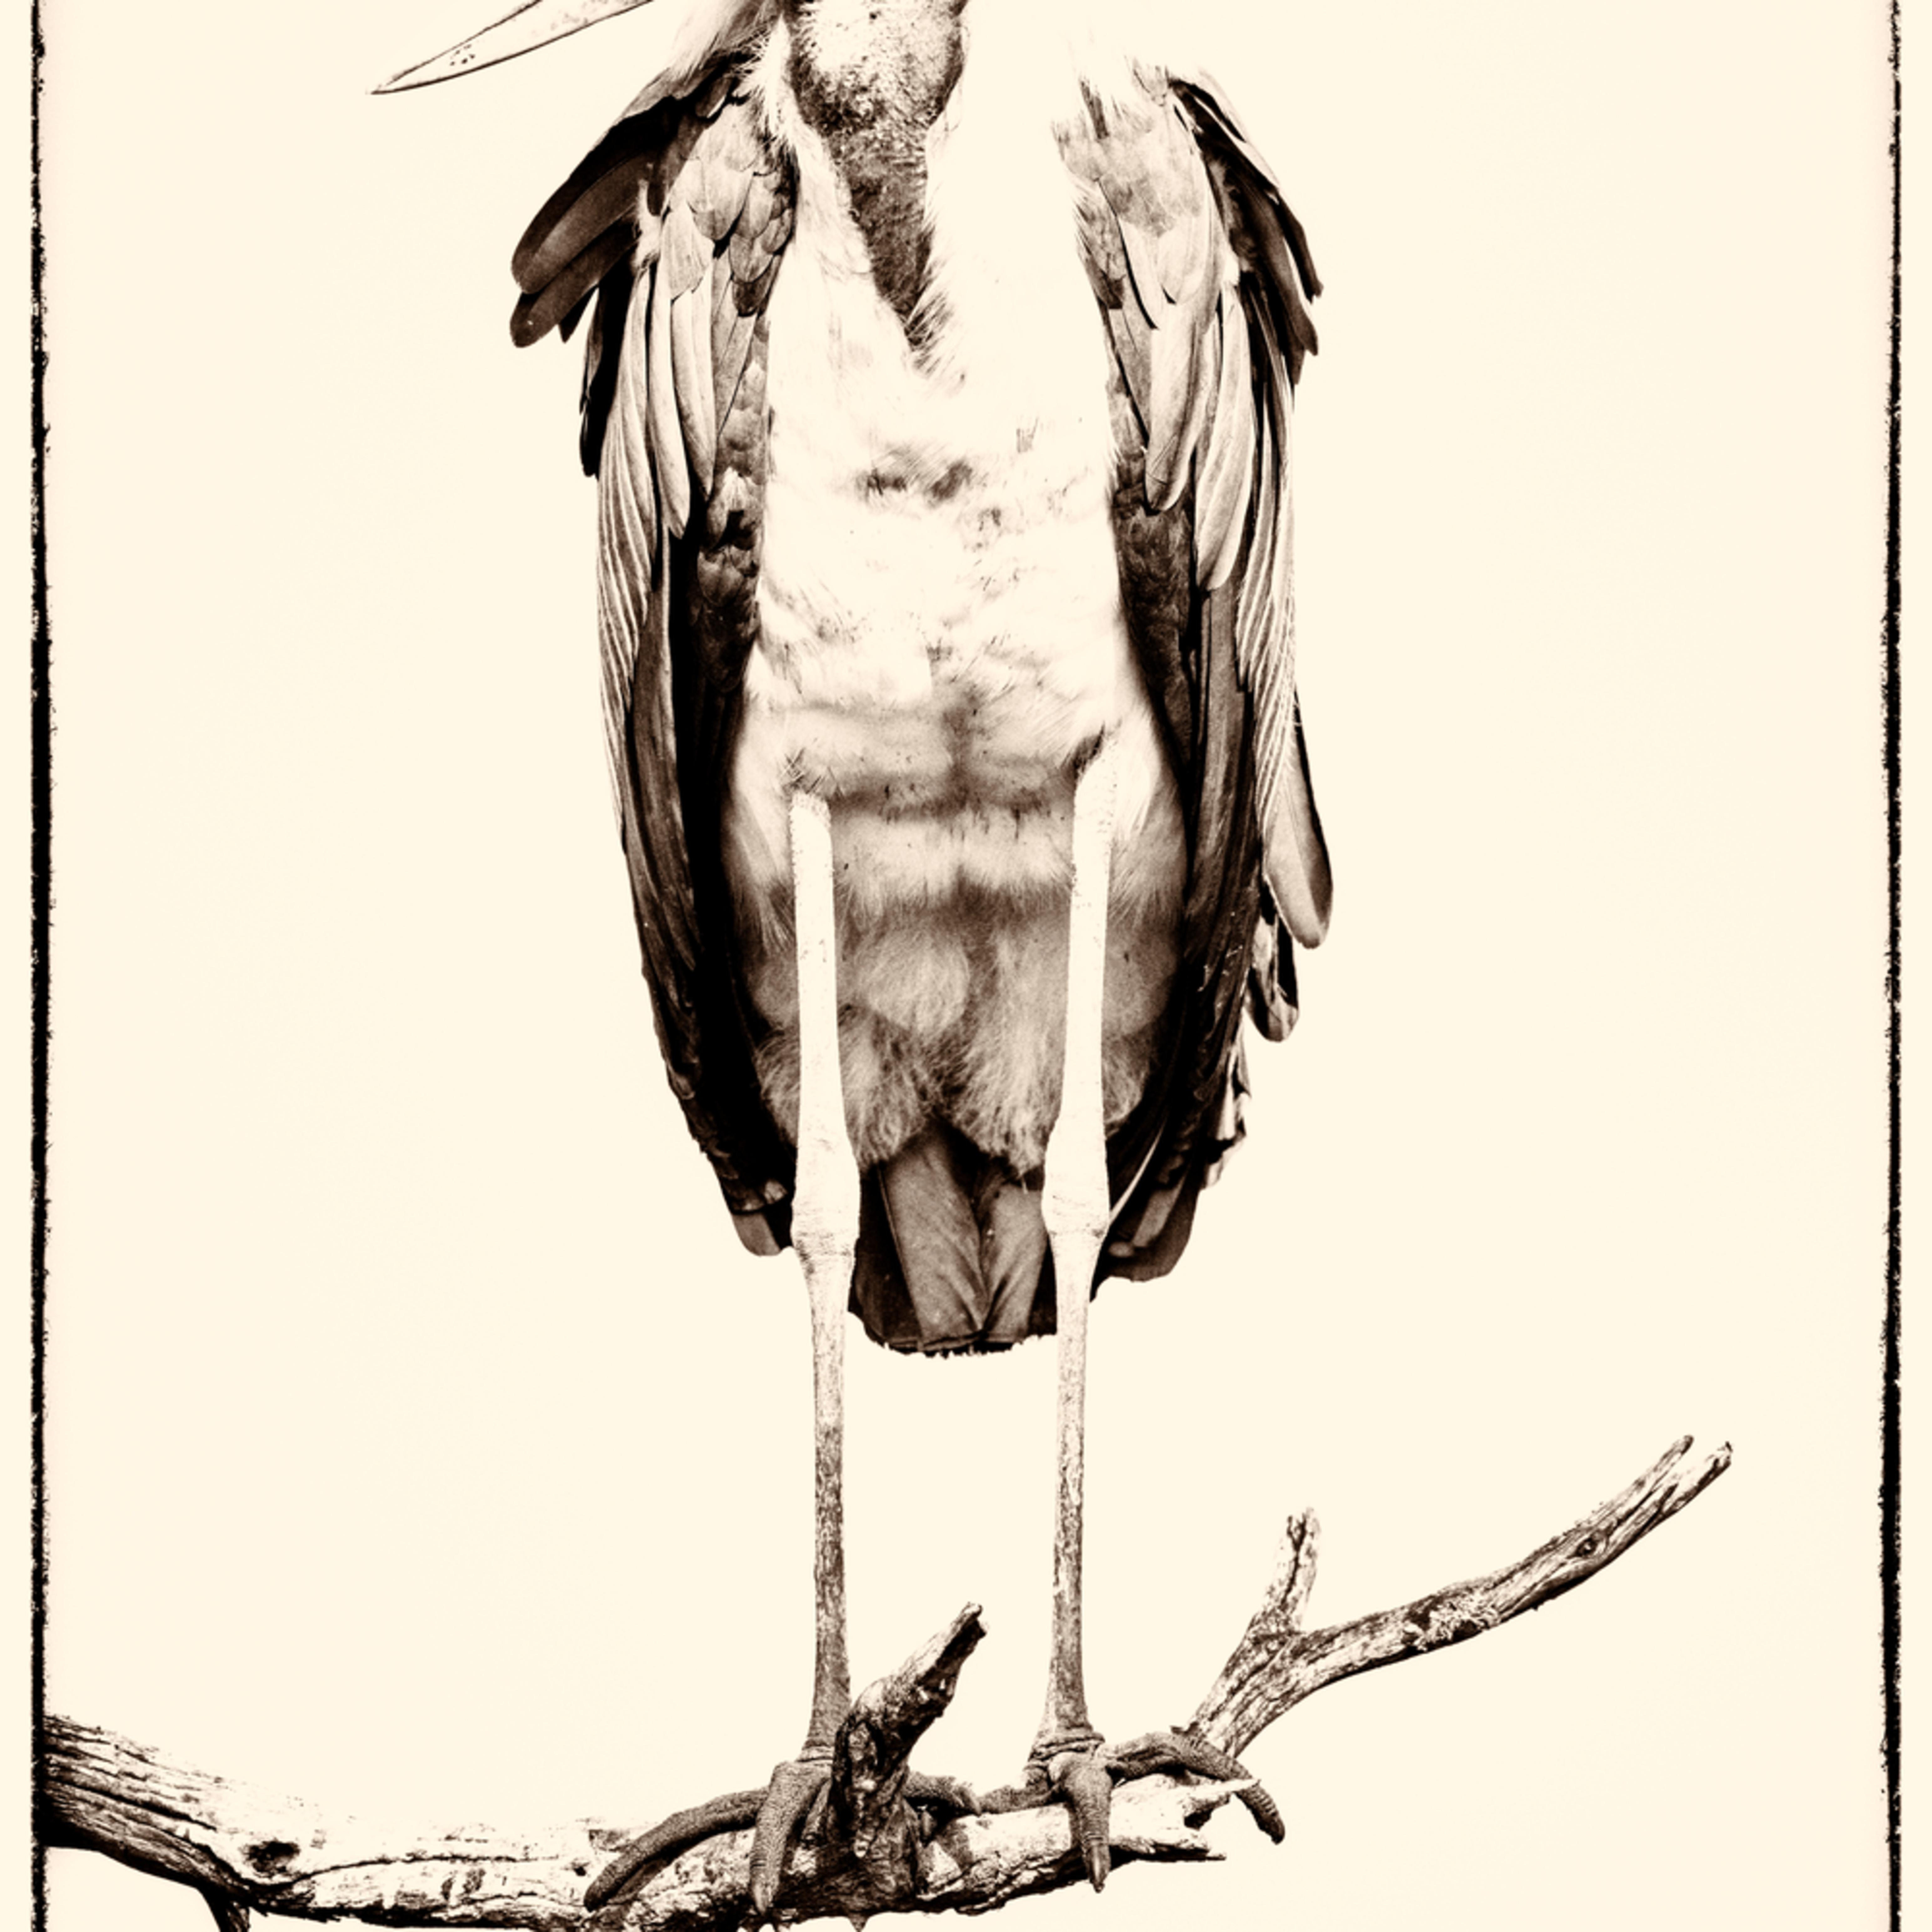 Marabou stork sepia dwasuk